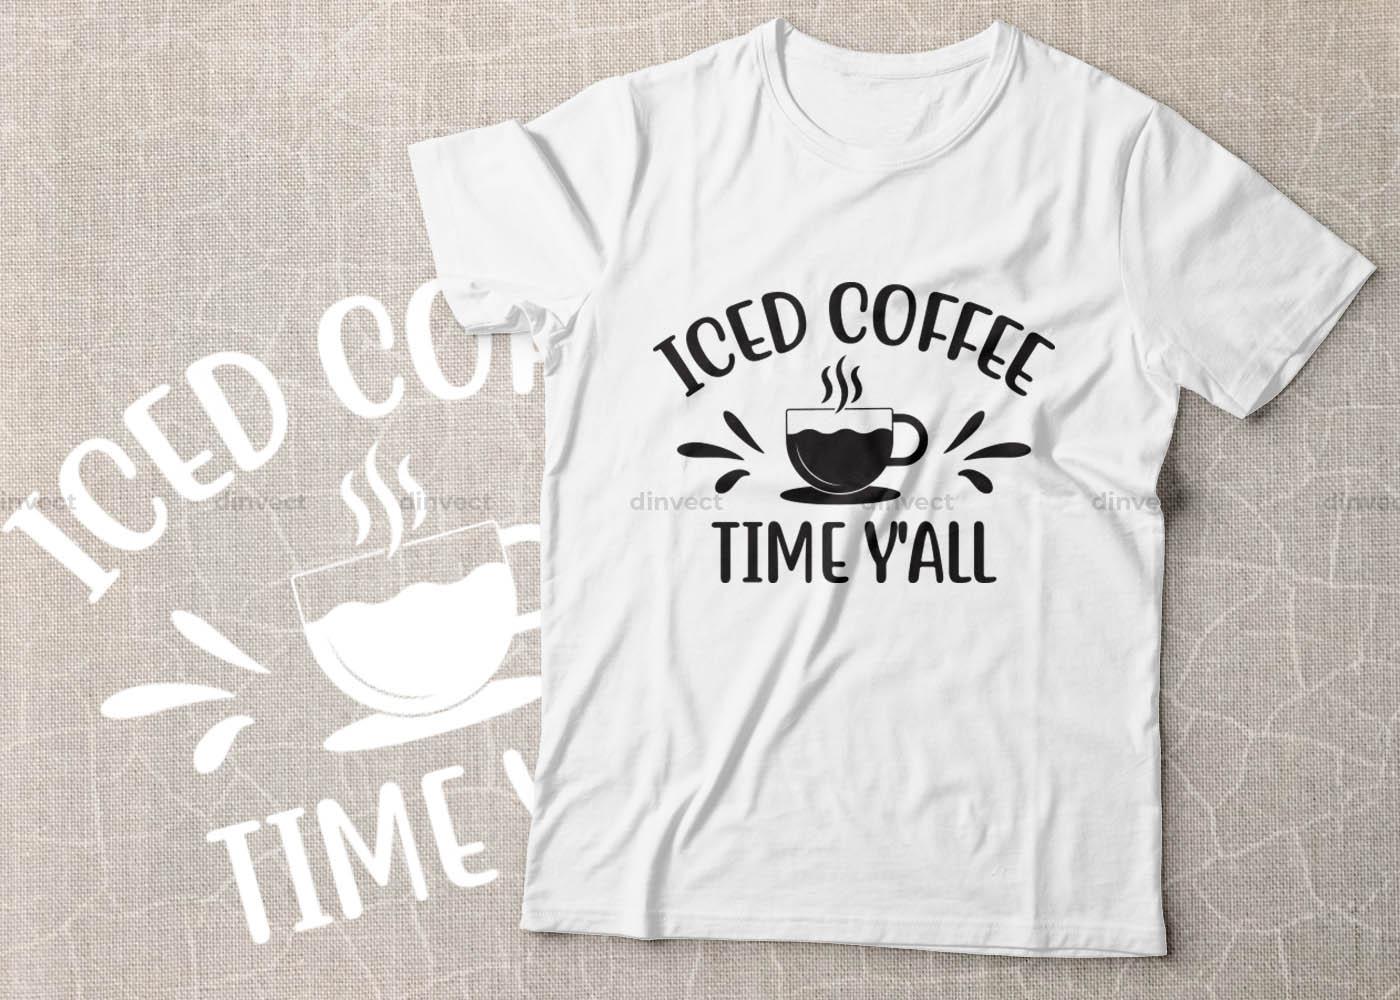 Coffee SVG, Coffee Bundle Svg, Coffee Mug Svg, Funny Coffee Quotes SVG, Mug Design Svg, Coffee Quote - Coffee 6 -